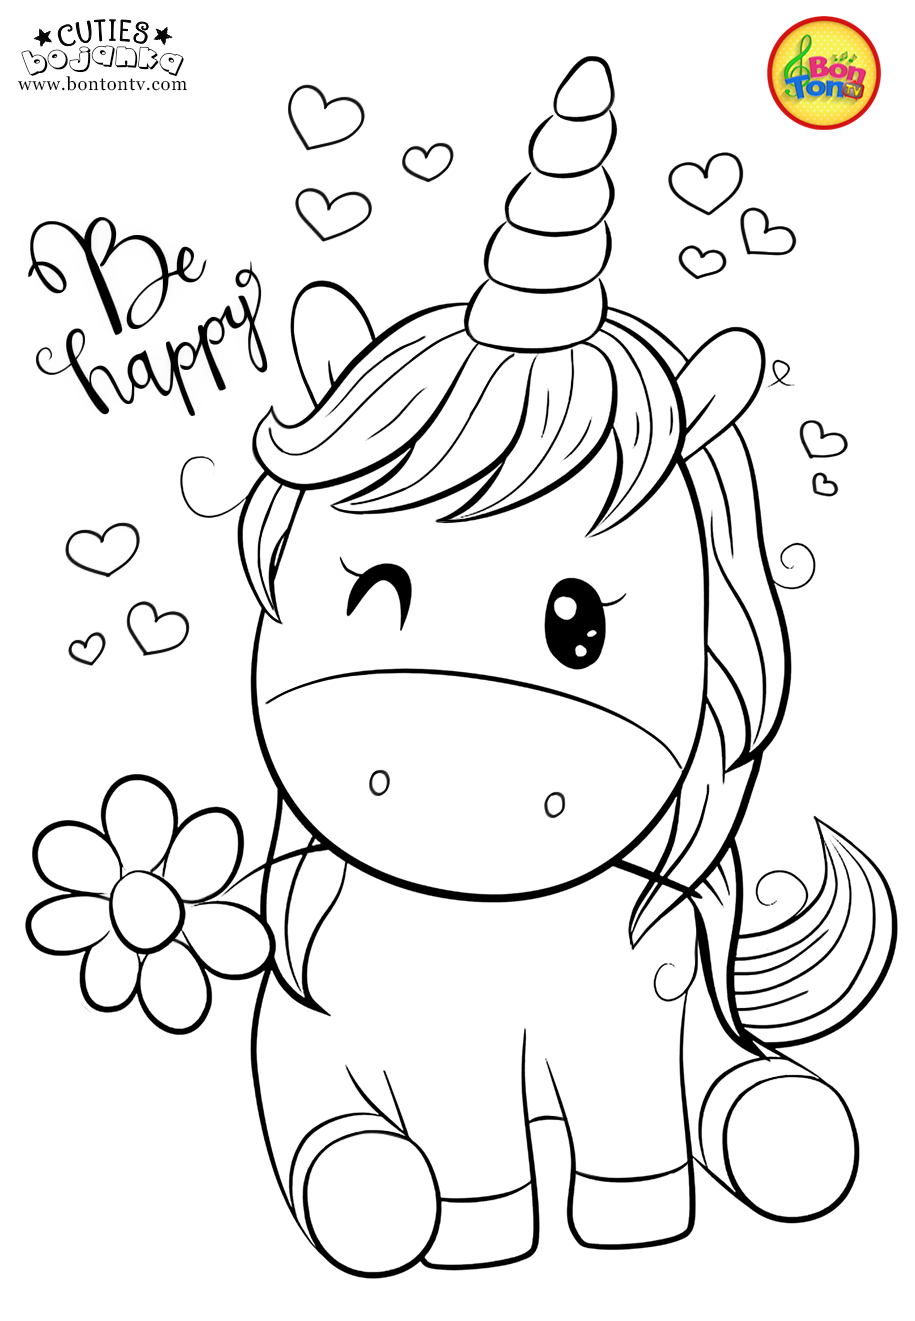 Cuties Coloring Pages For Kids Free Preschool Printables Slatkice Bojanke Cute Animal Preschool Coloring Pages Unicorn Coloring Pages Kids Coloring Books